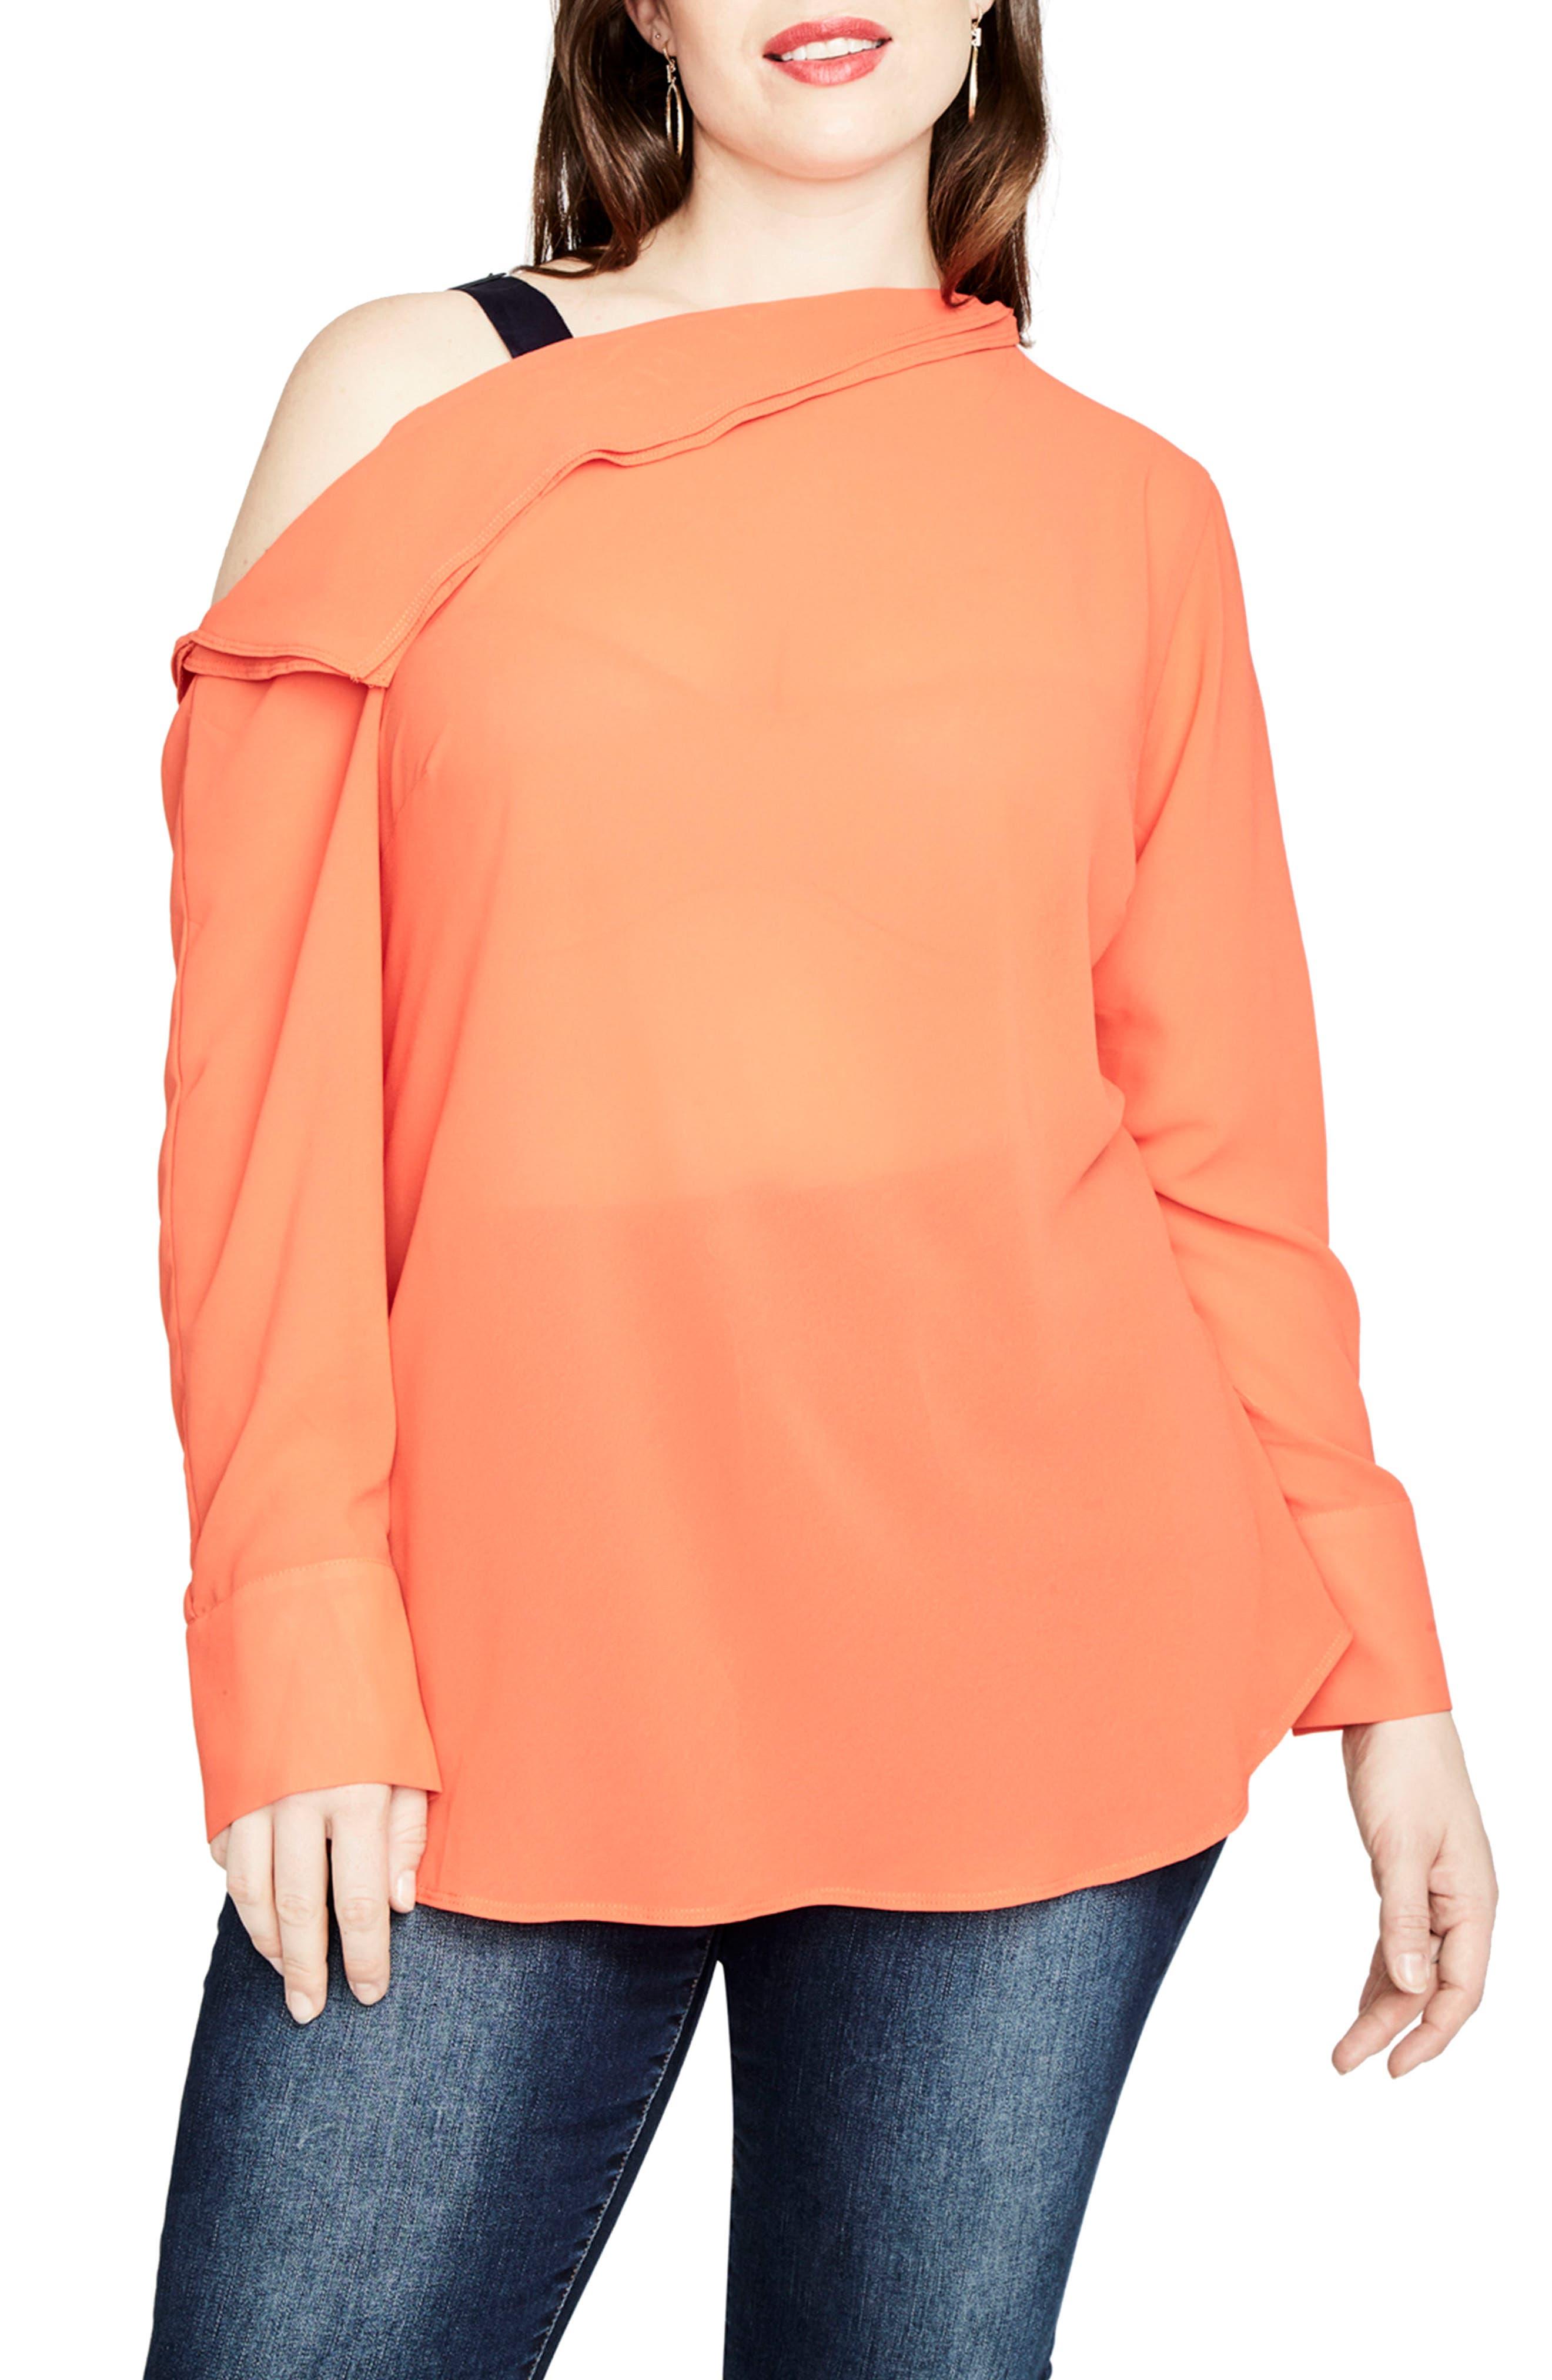 Alternate Image 1 Selected - RACHEL Rachel Roy One-Shoulder Top (Plus Size)